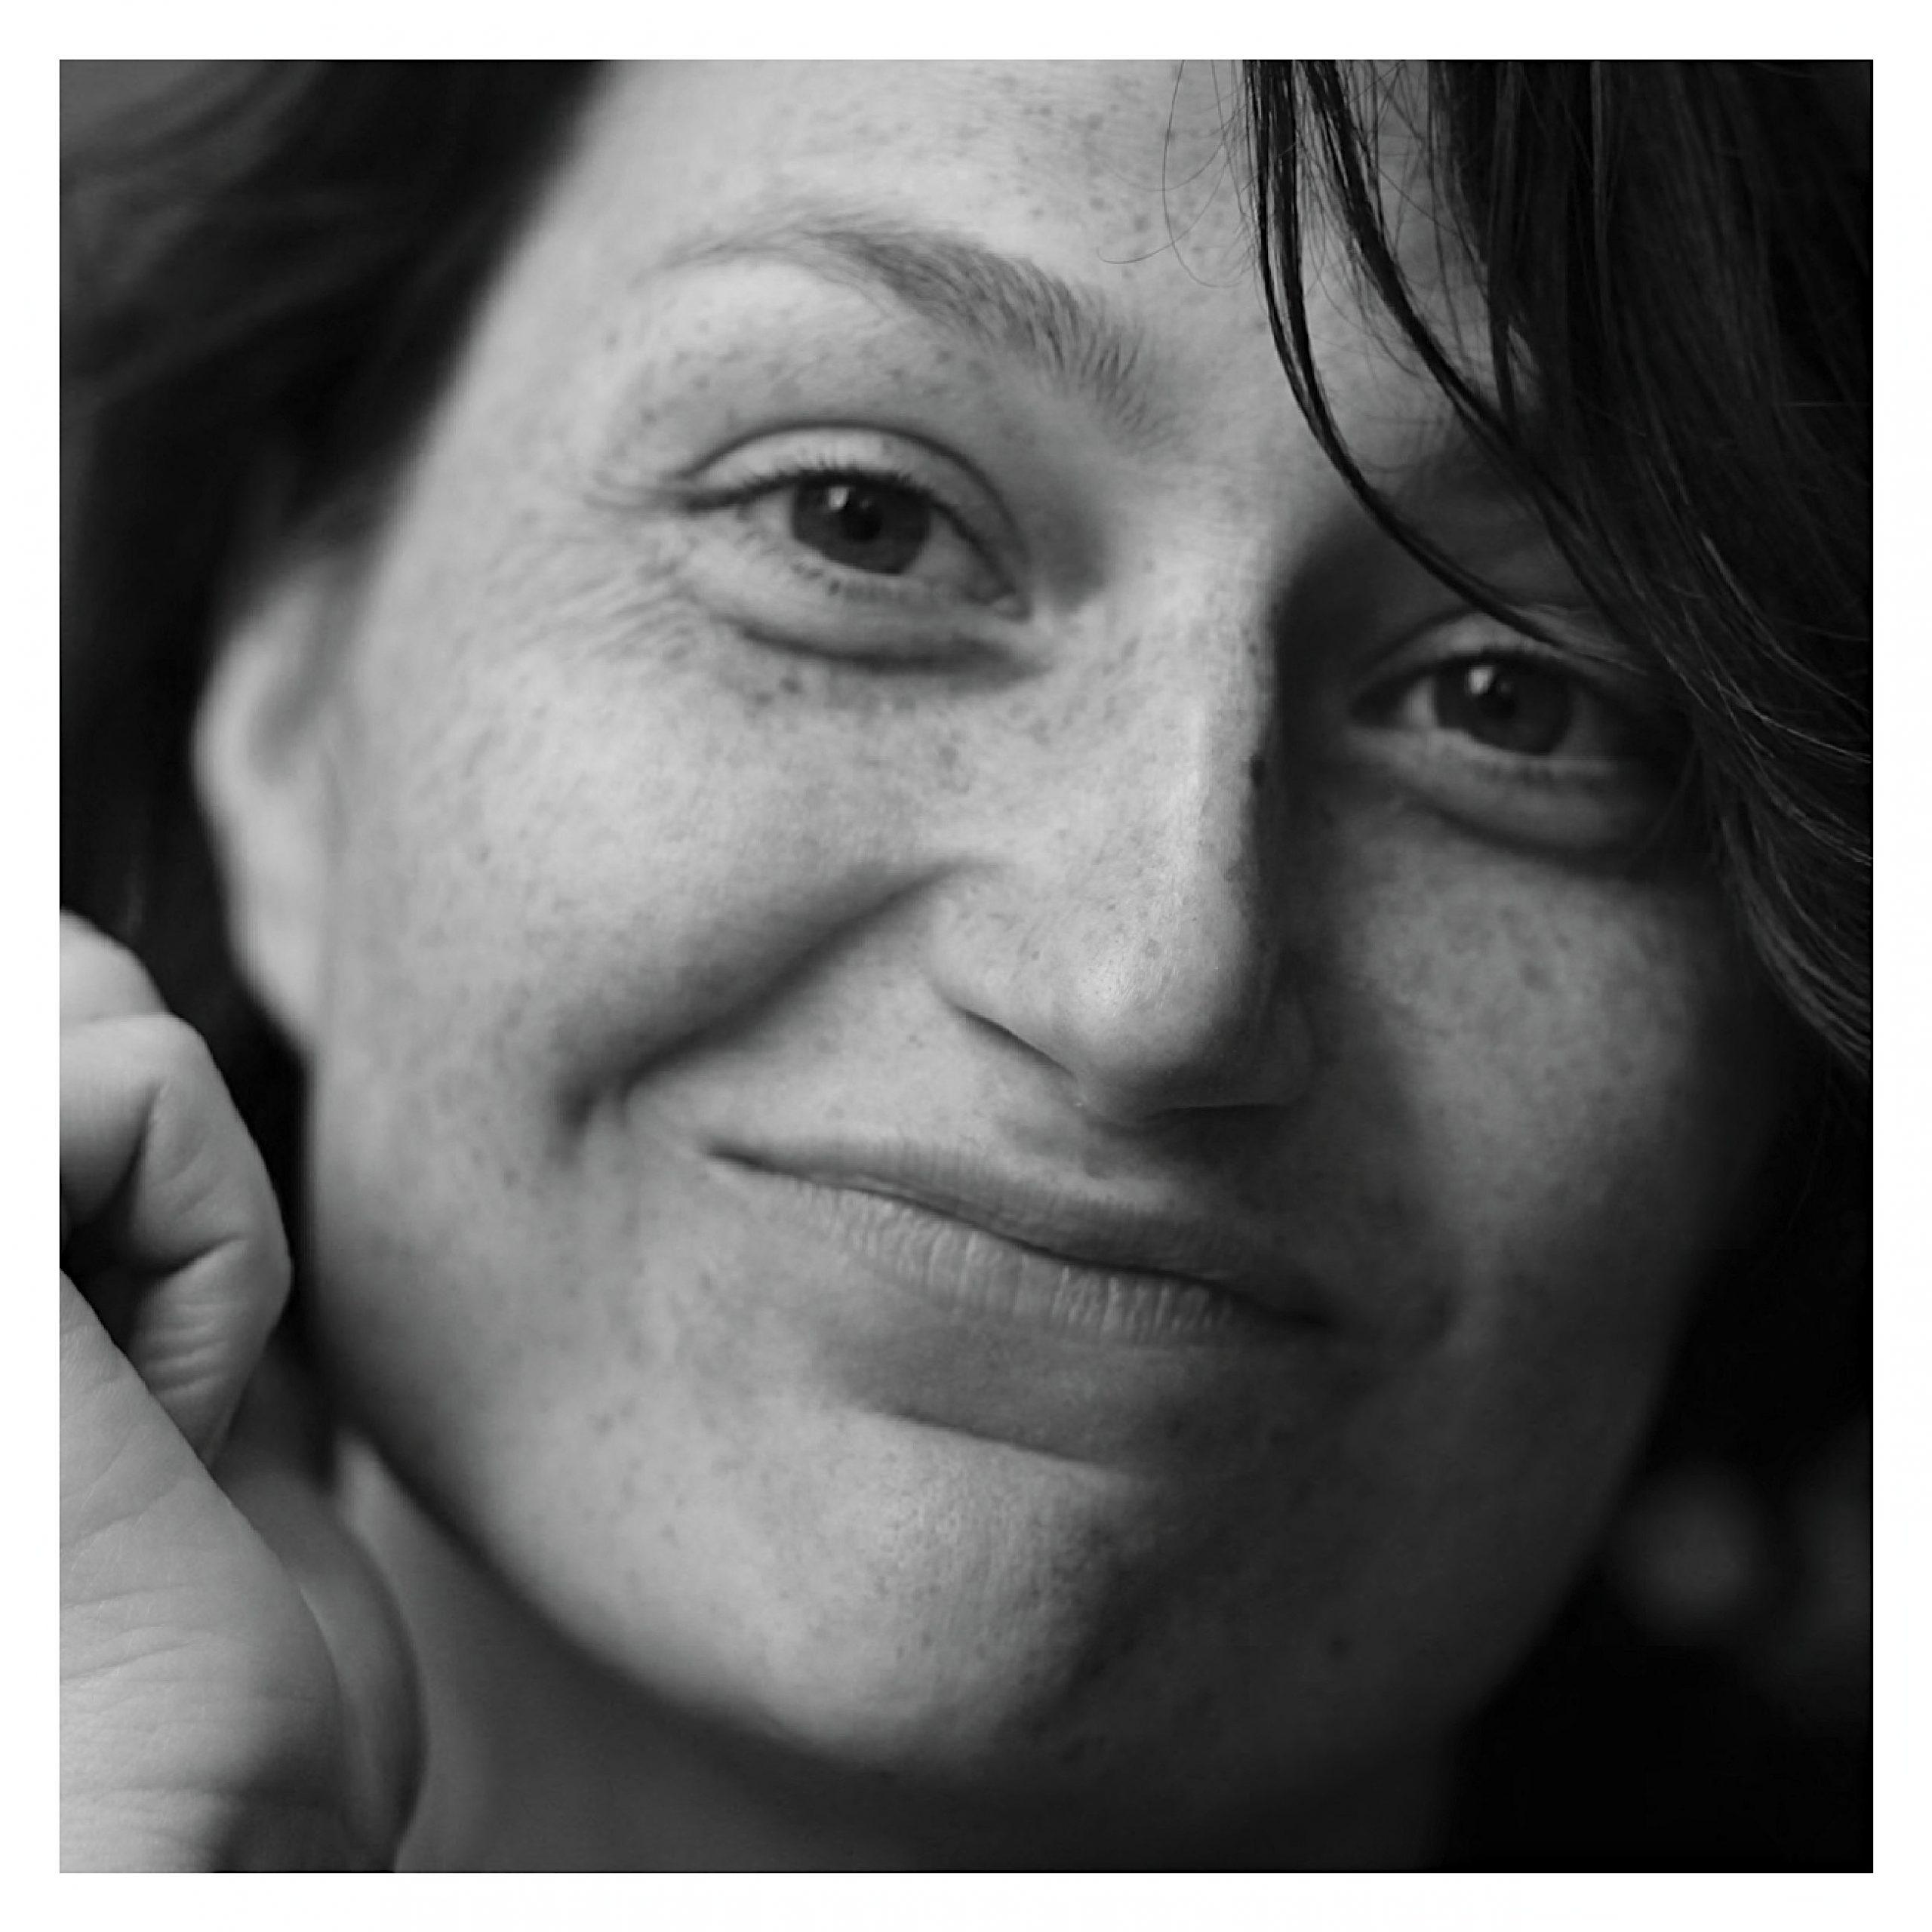 Annekathrin Gröninger